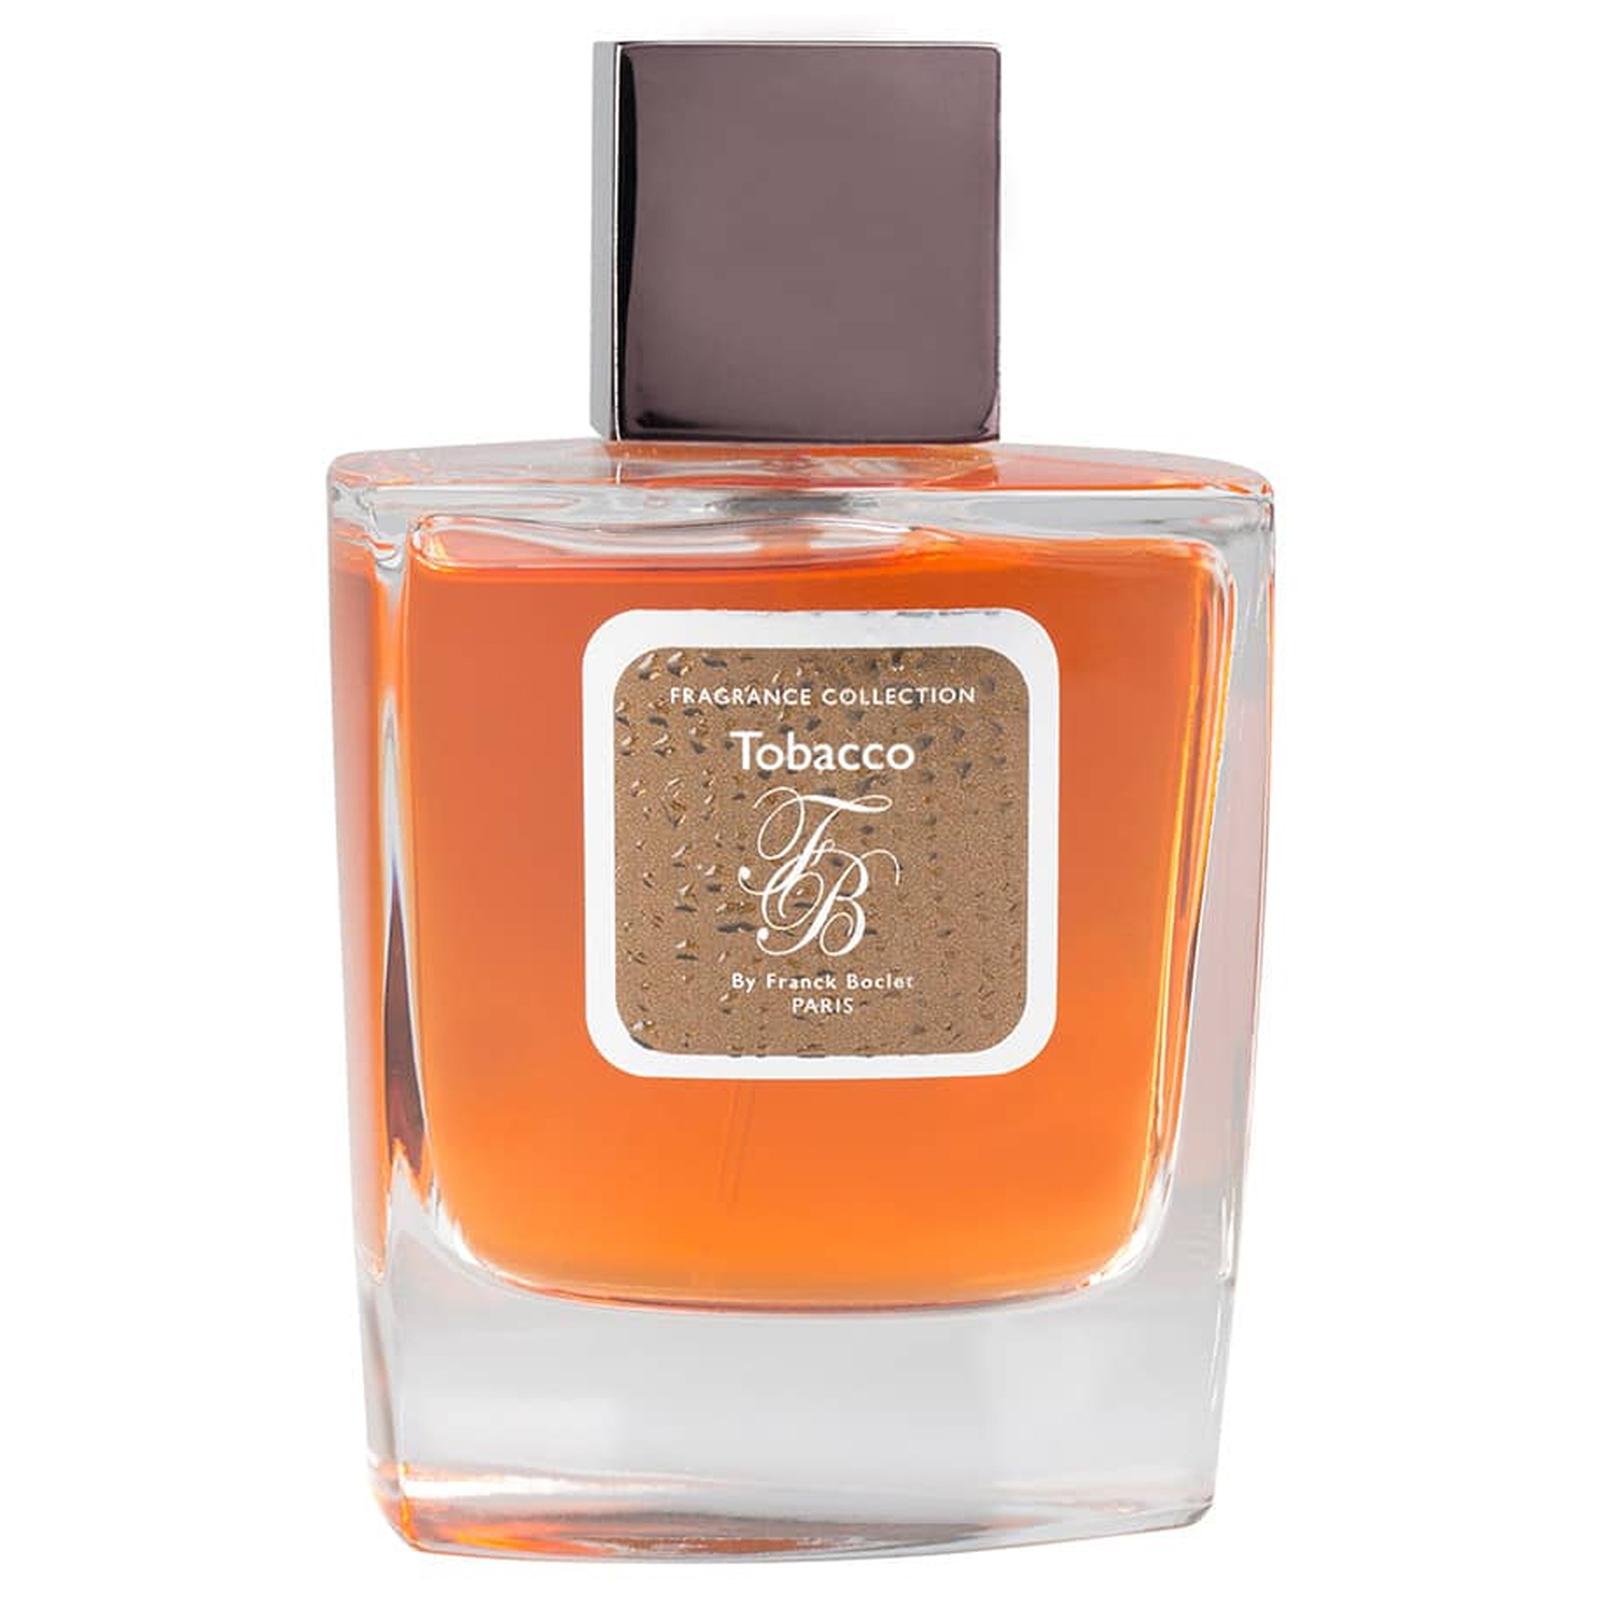 FRANCK BOCLET Tobacco Perfume Eau De Parfum 100 Ml in White